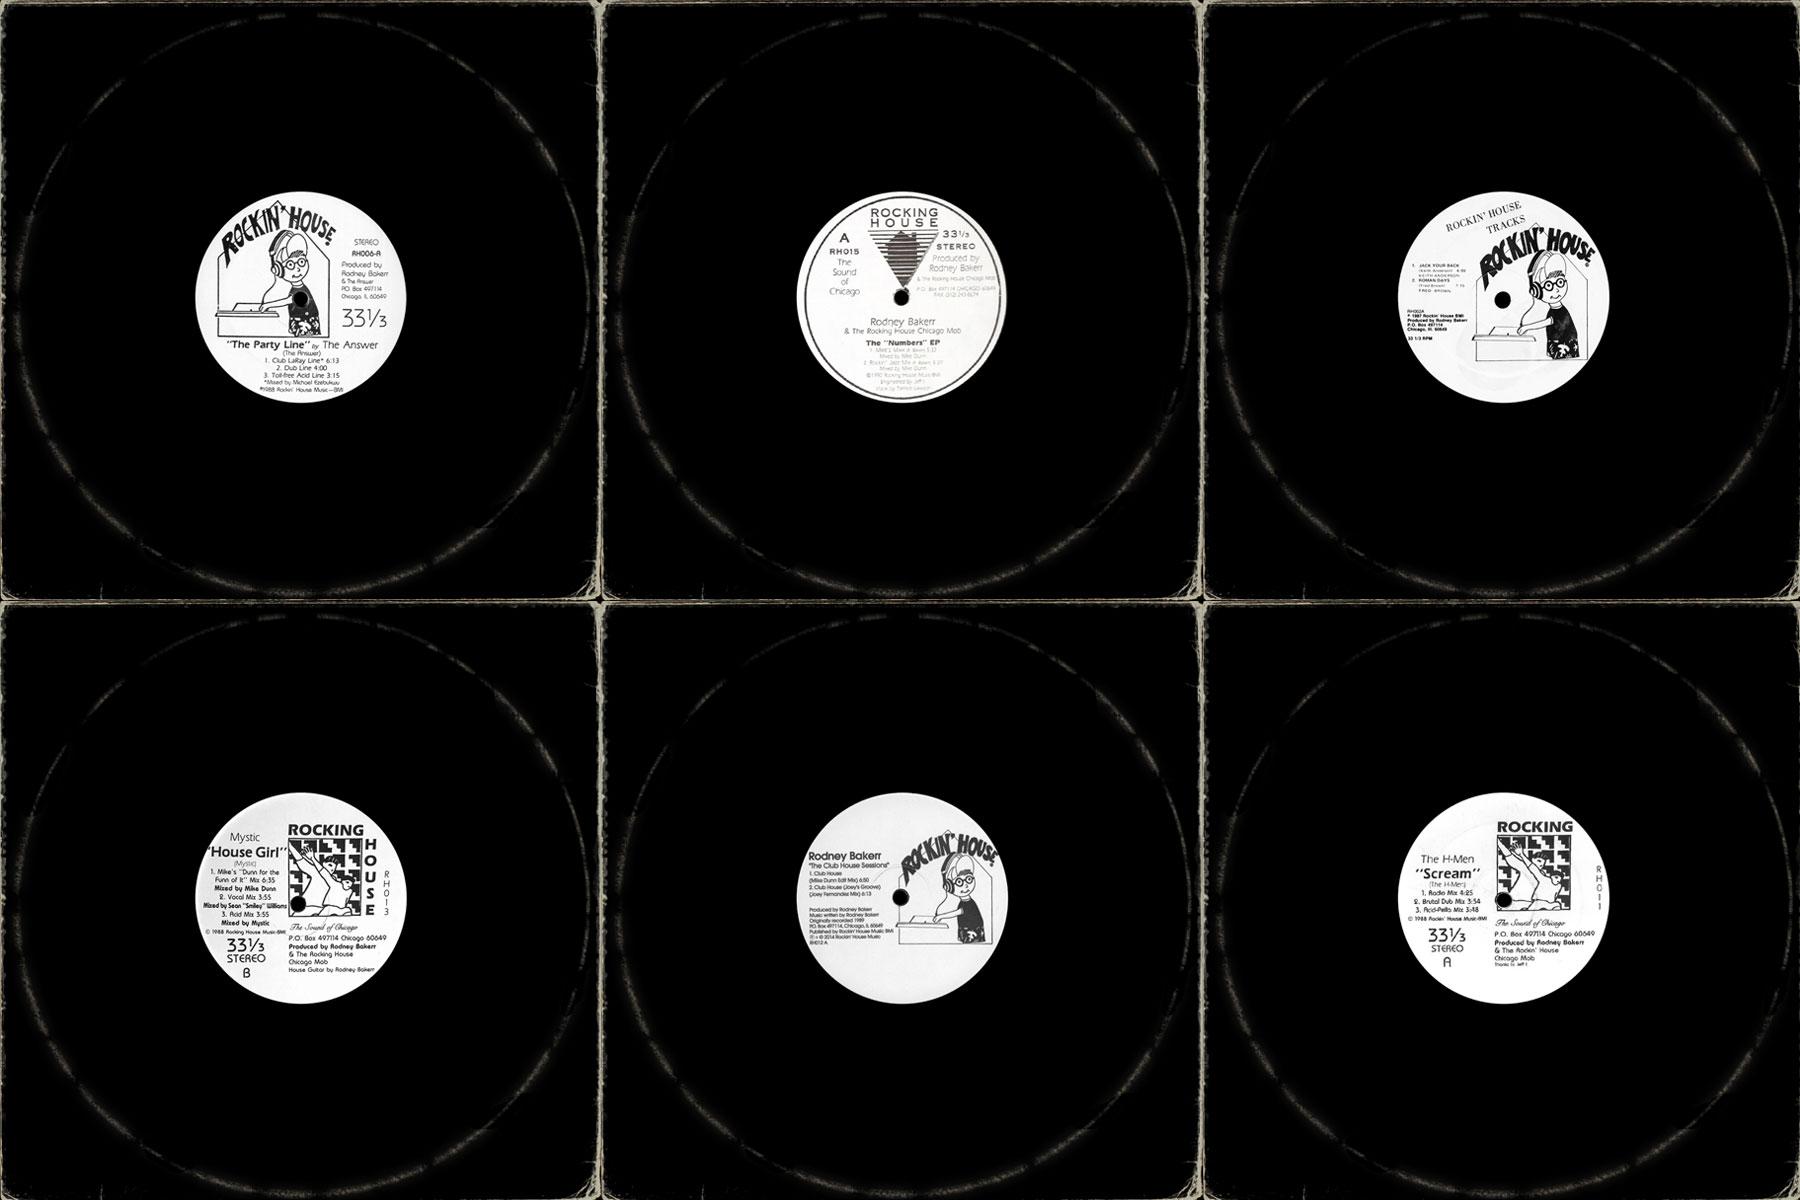 Mr. Bakerr's Half Dozen: 6 rarities from Rodney Bakerr & the Rockin' House catalog